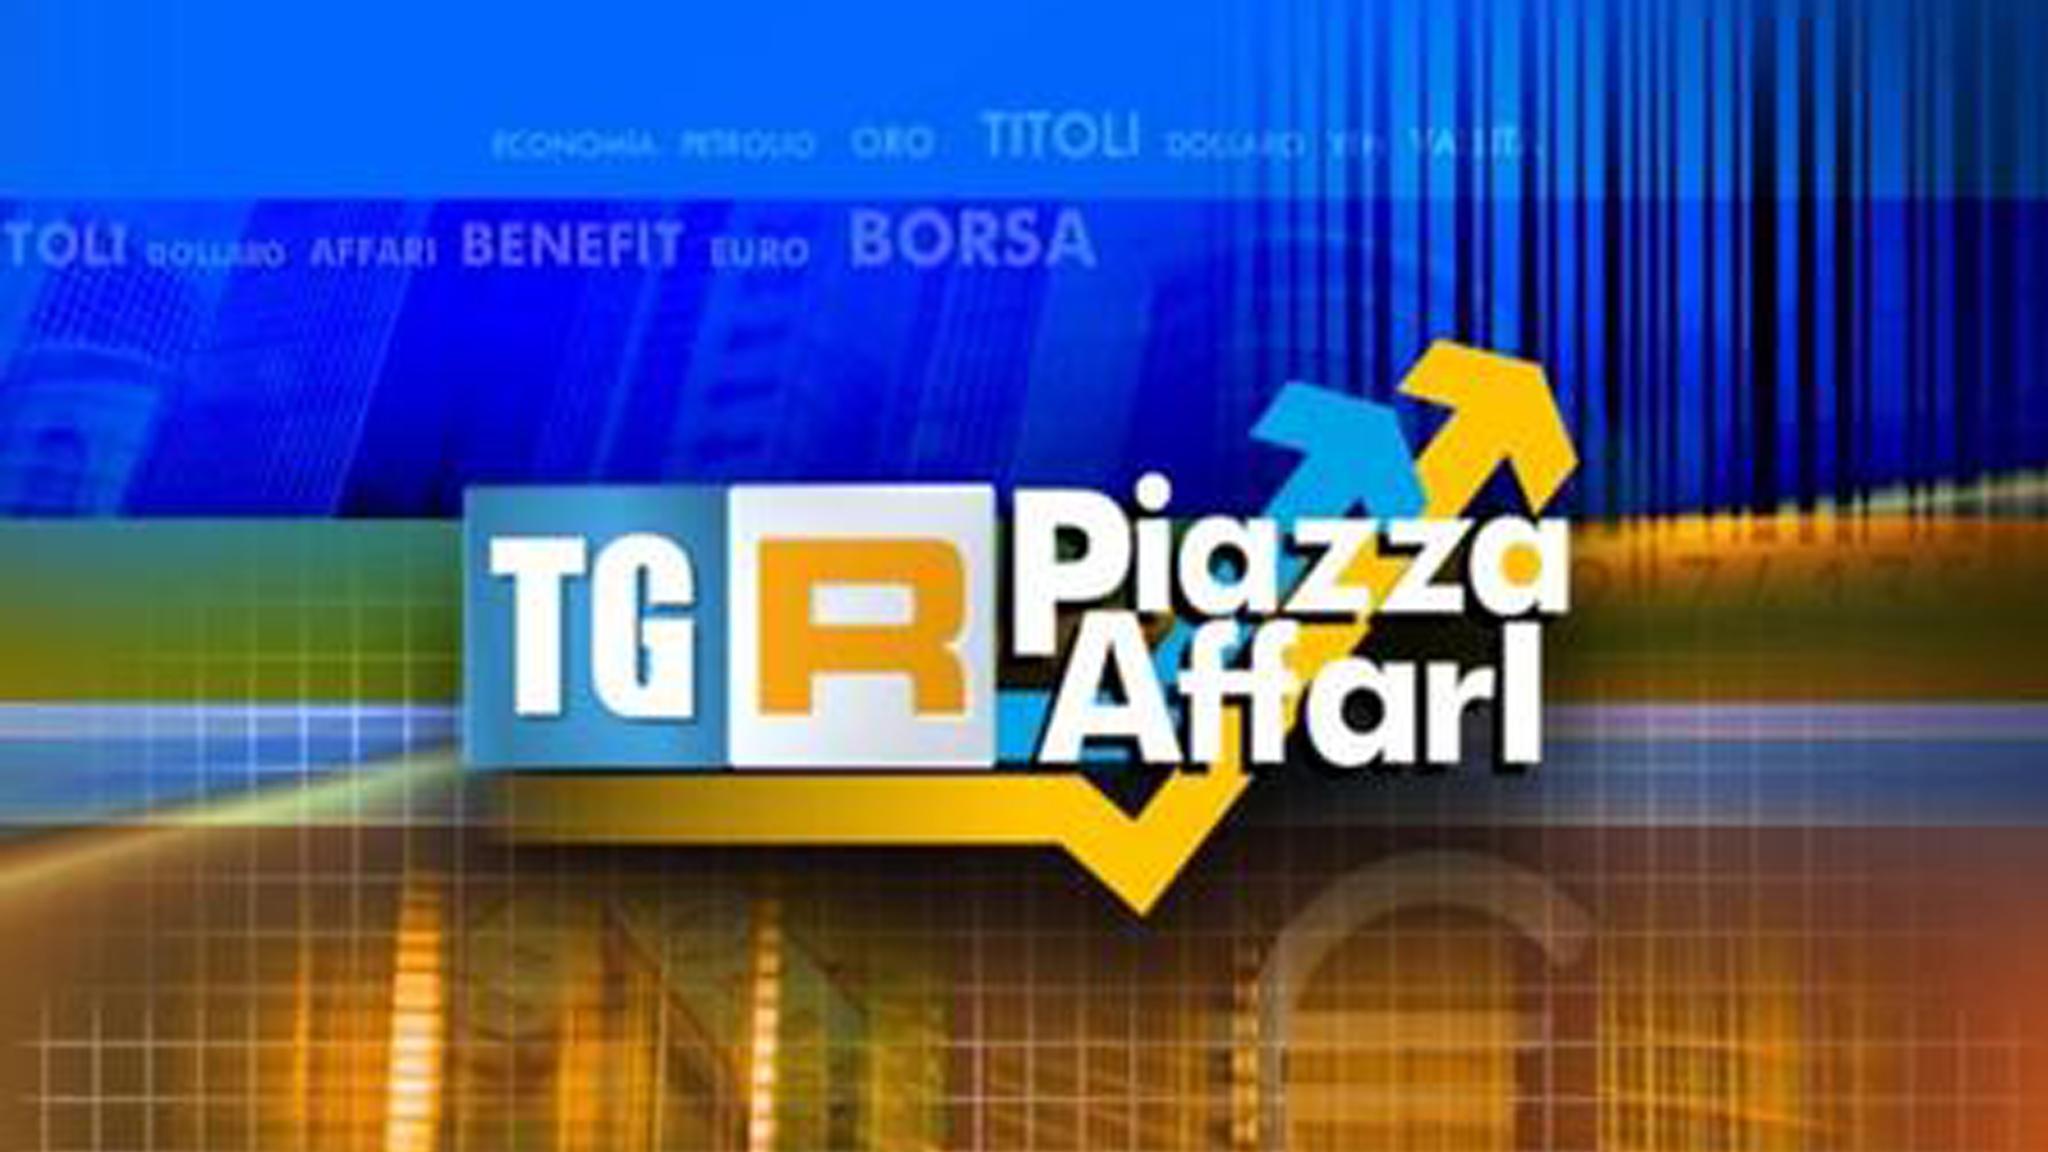 TGR Piazza Affari